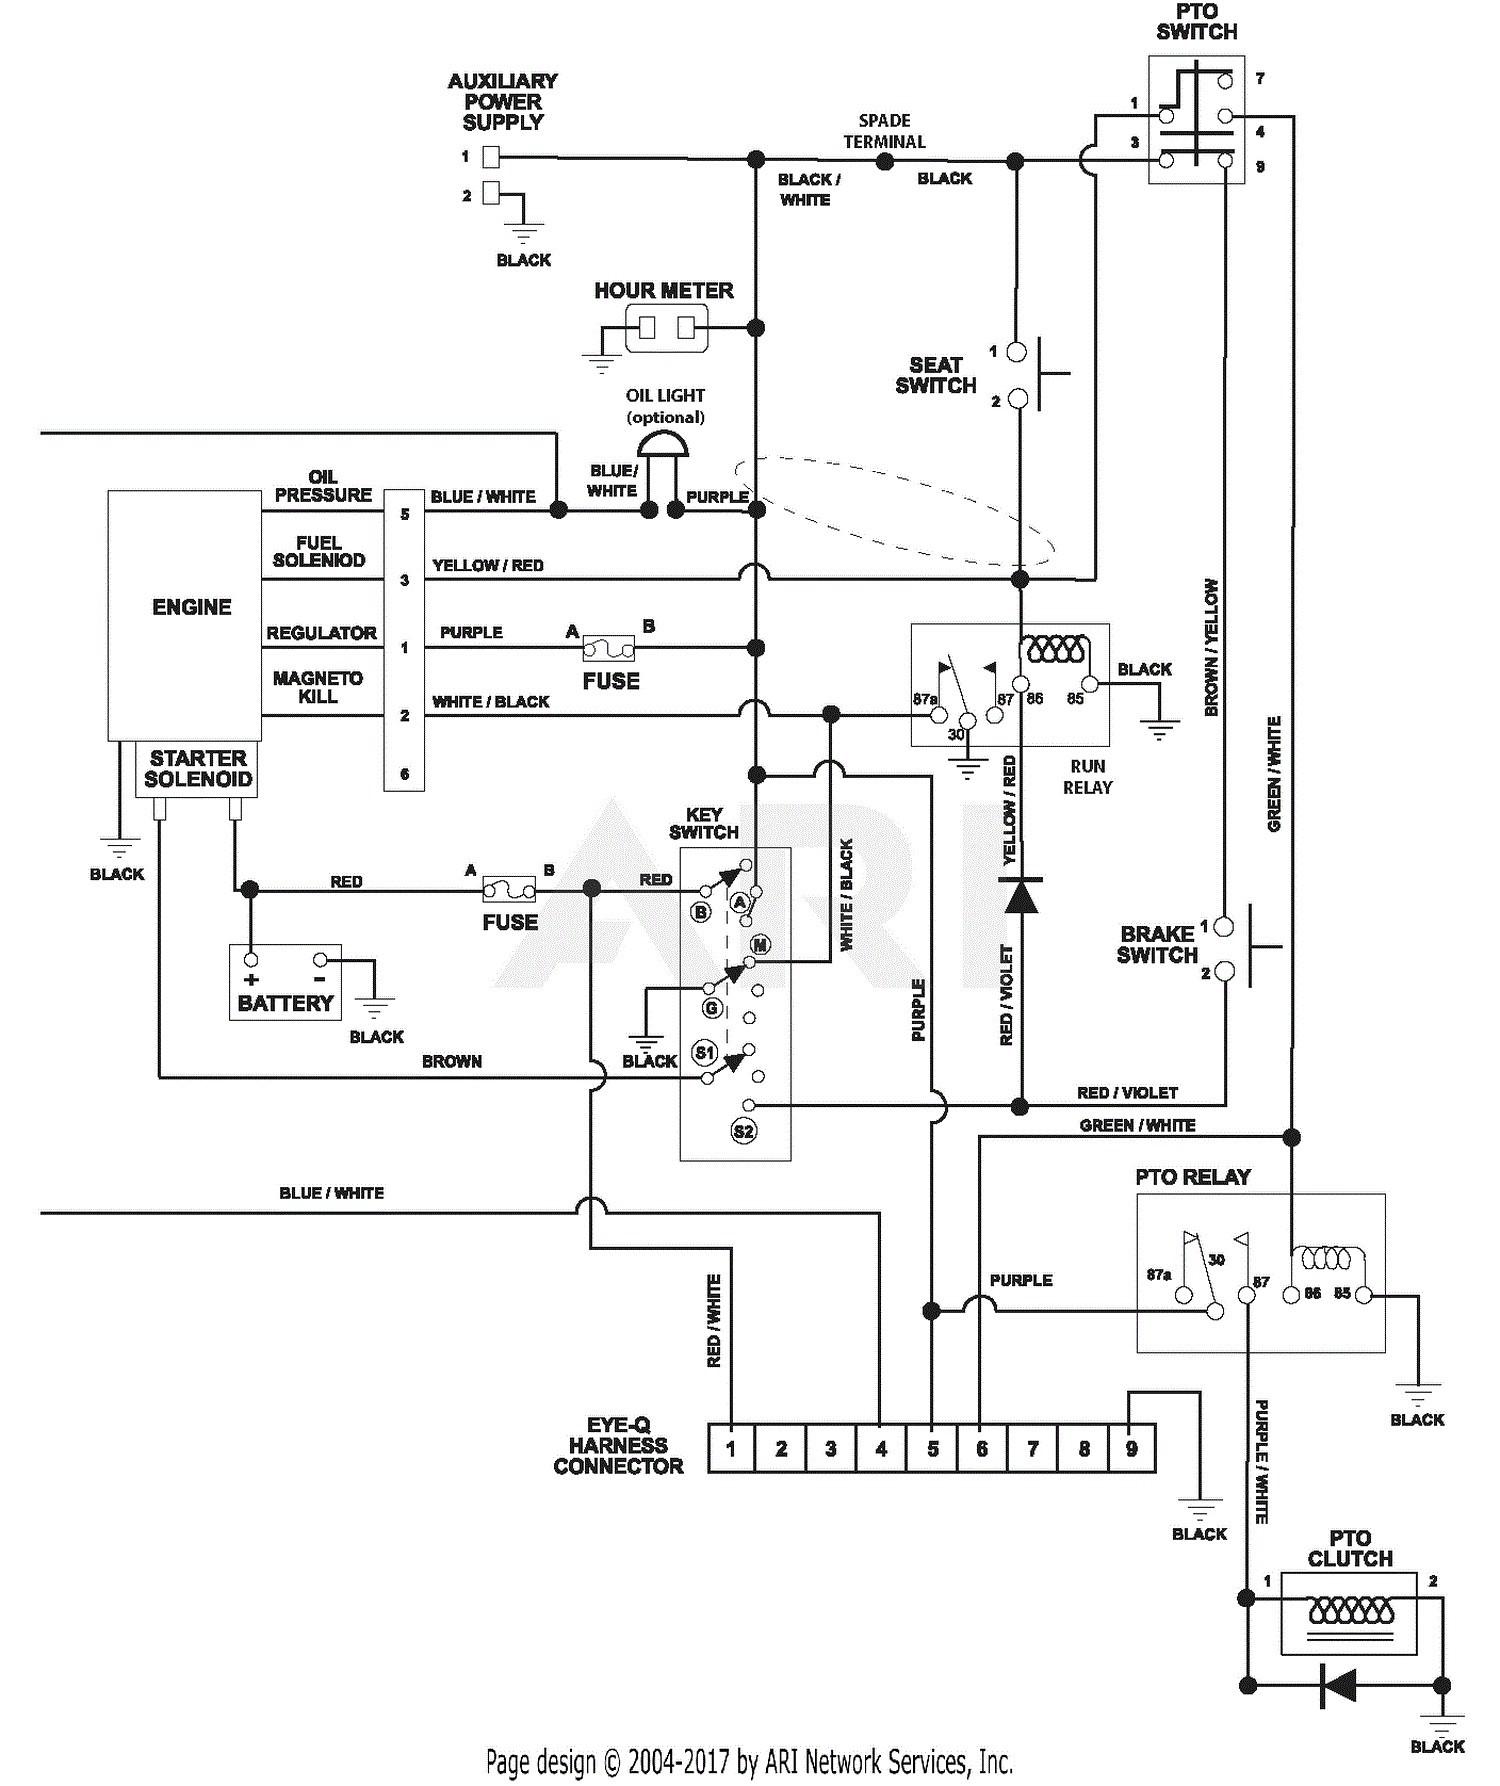 Wright Wszk Wiring Diagram Wright Stander Wiring Diagram Of Wright Wszk Wiring Diagram